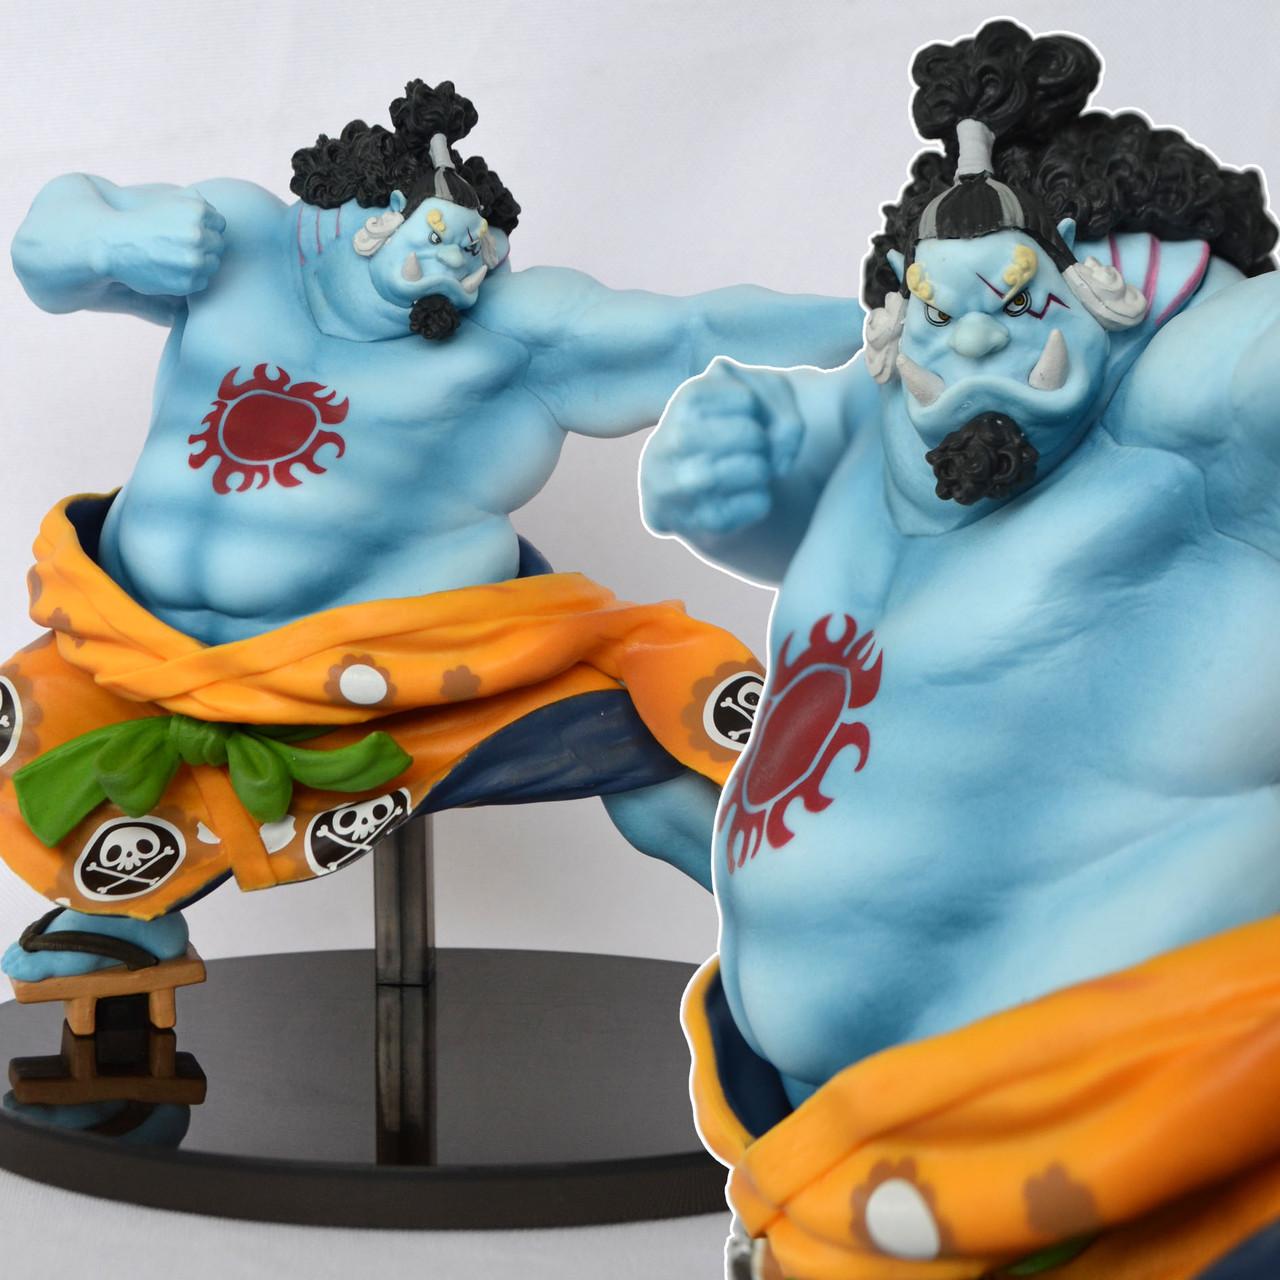 Фігурка One piece – Jinbei – WORLD FIGURE COLOSSEUM2 vol.4 – Banpresto